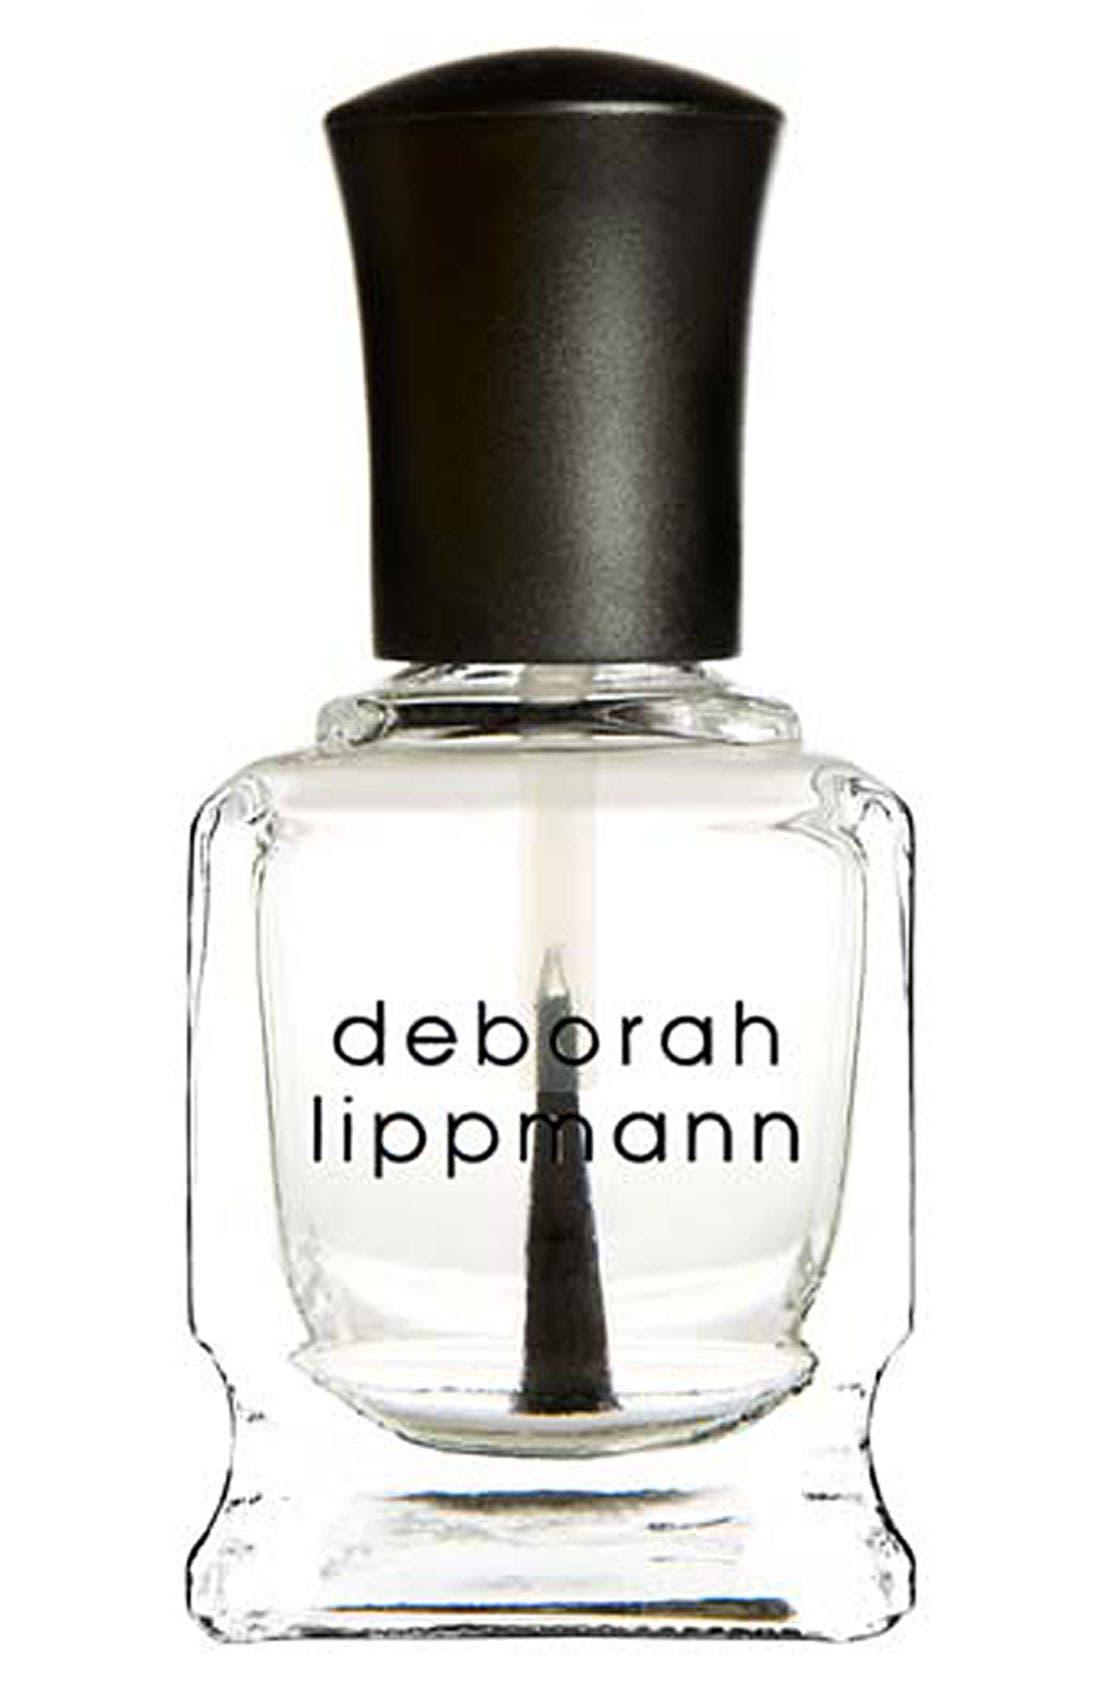 Deborah Lippmann 'Addicted To Speed' Ultra Quick Dry Topcoat